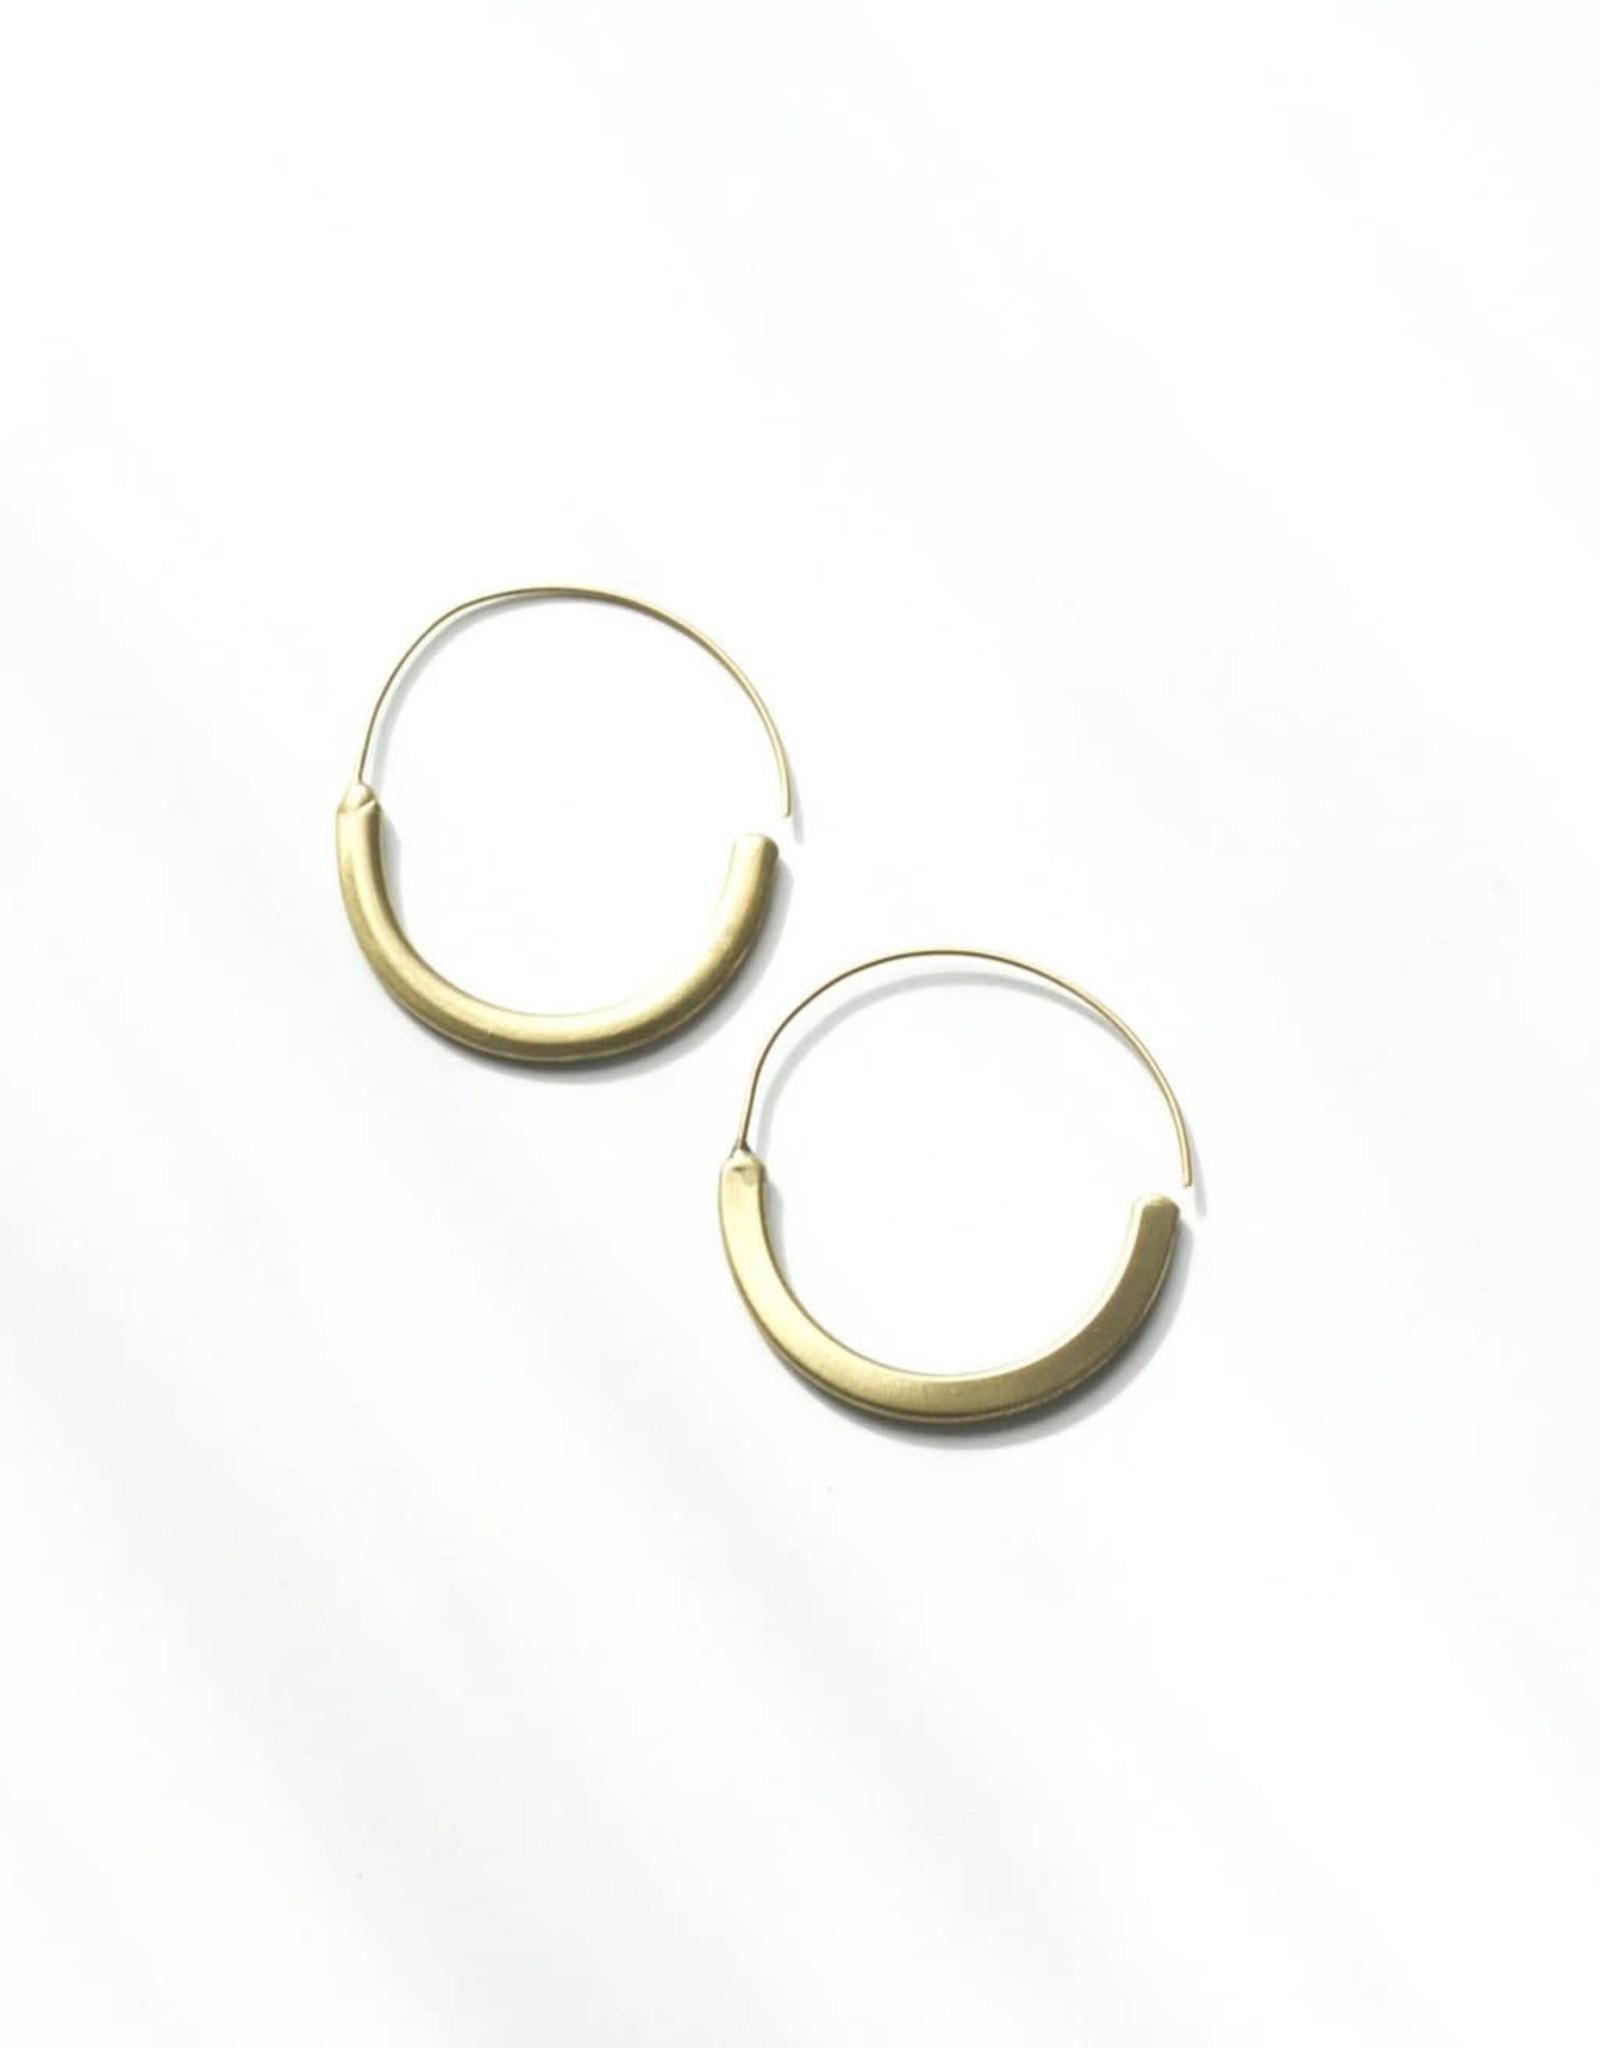 Rover & Kin Rover & Kin |Slim Threader Earrings